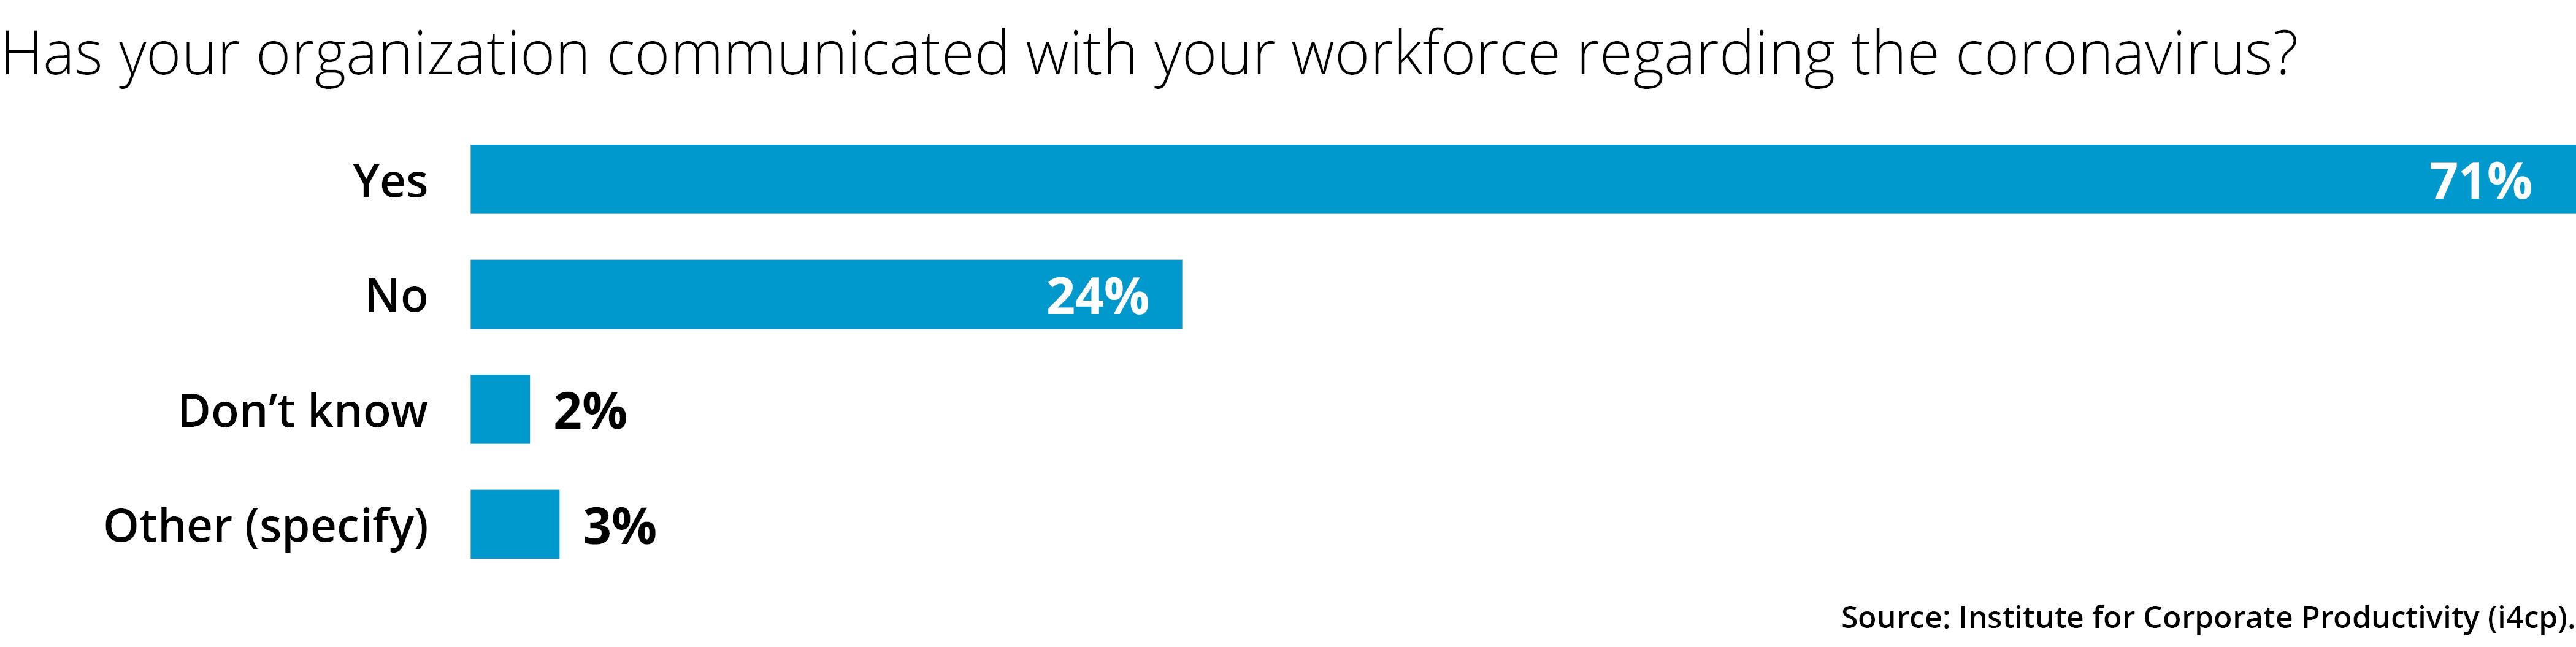 Has your organization communicated with your workforce regarding the coronavirus